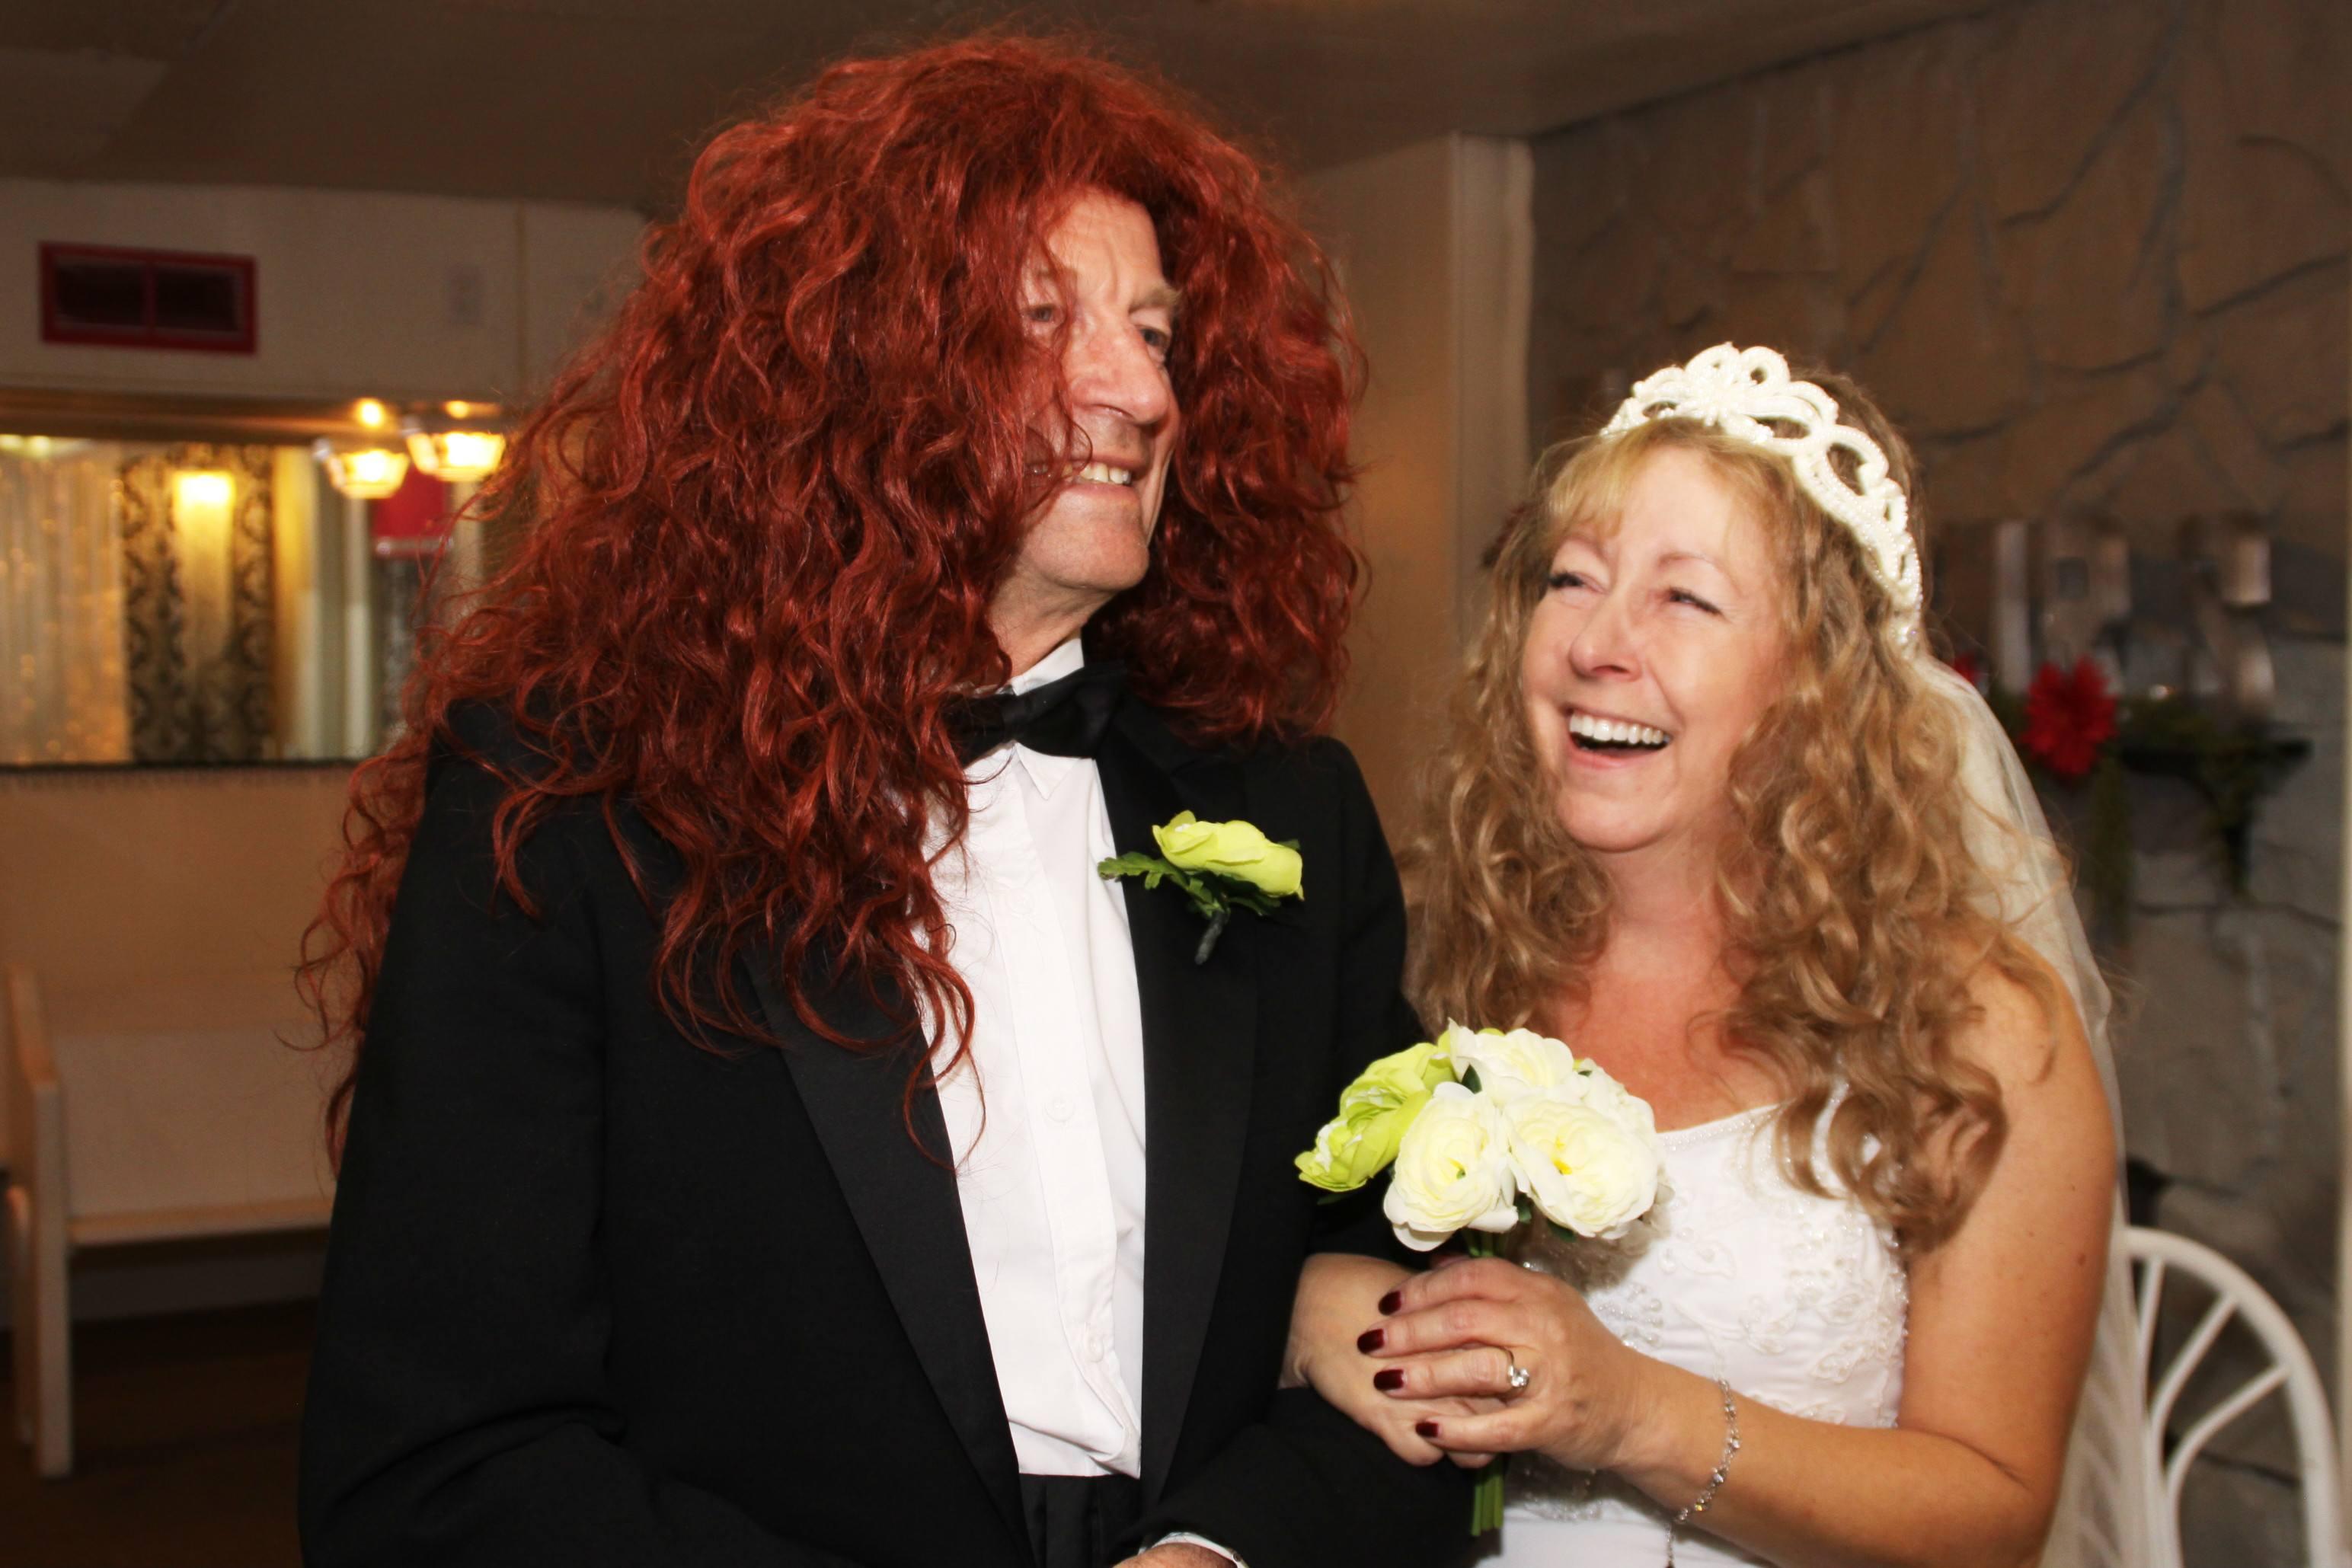 bride and groom, both wearing wigs.